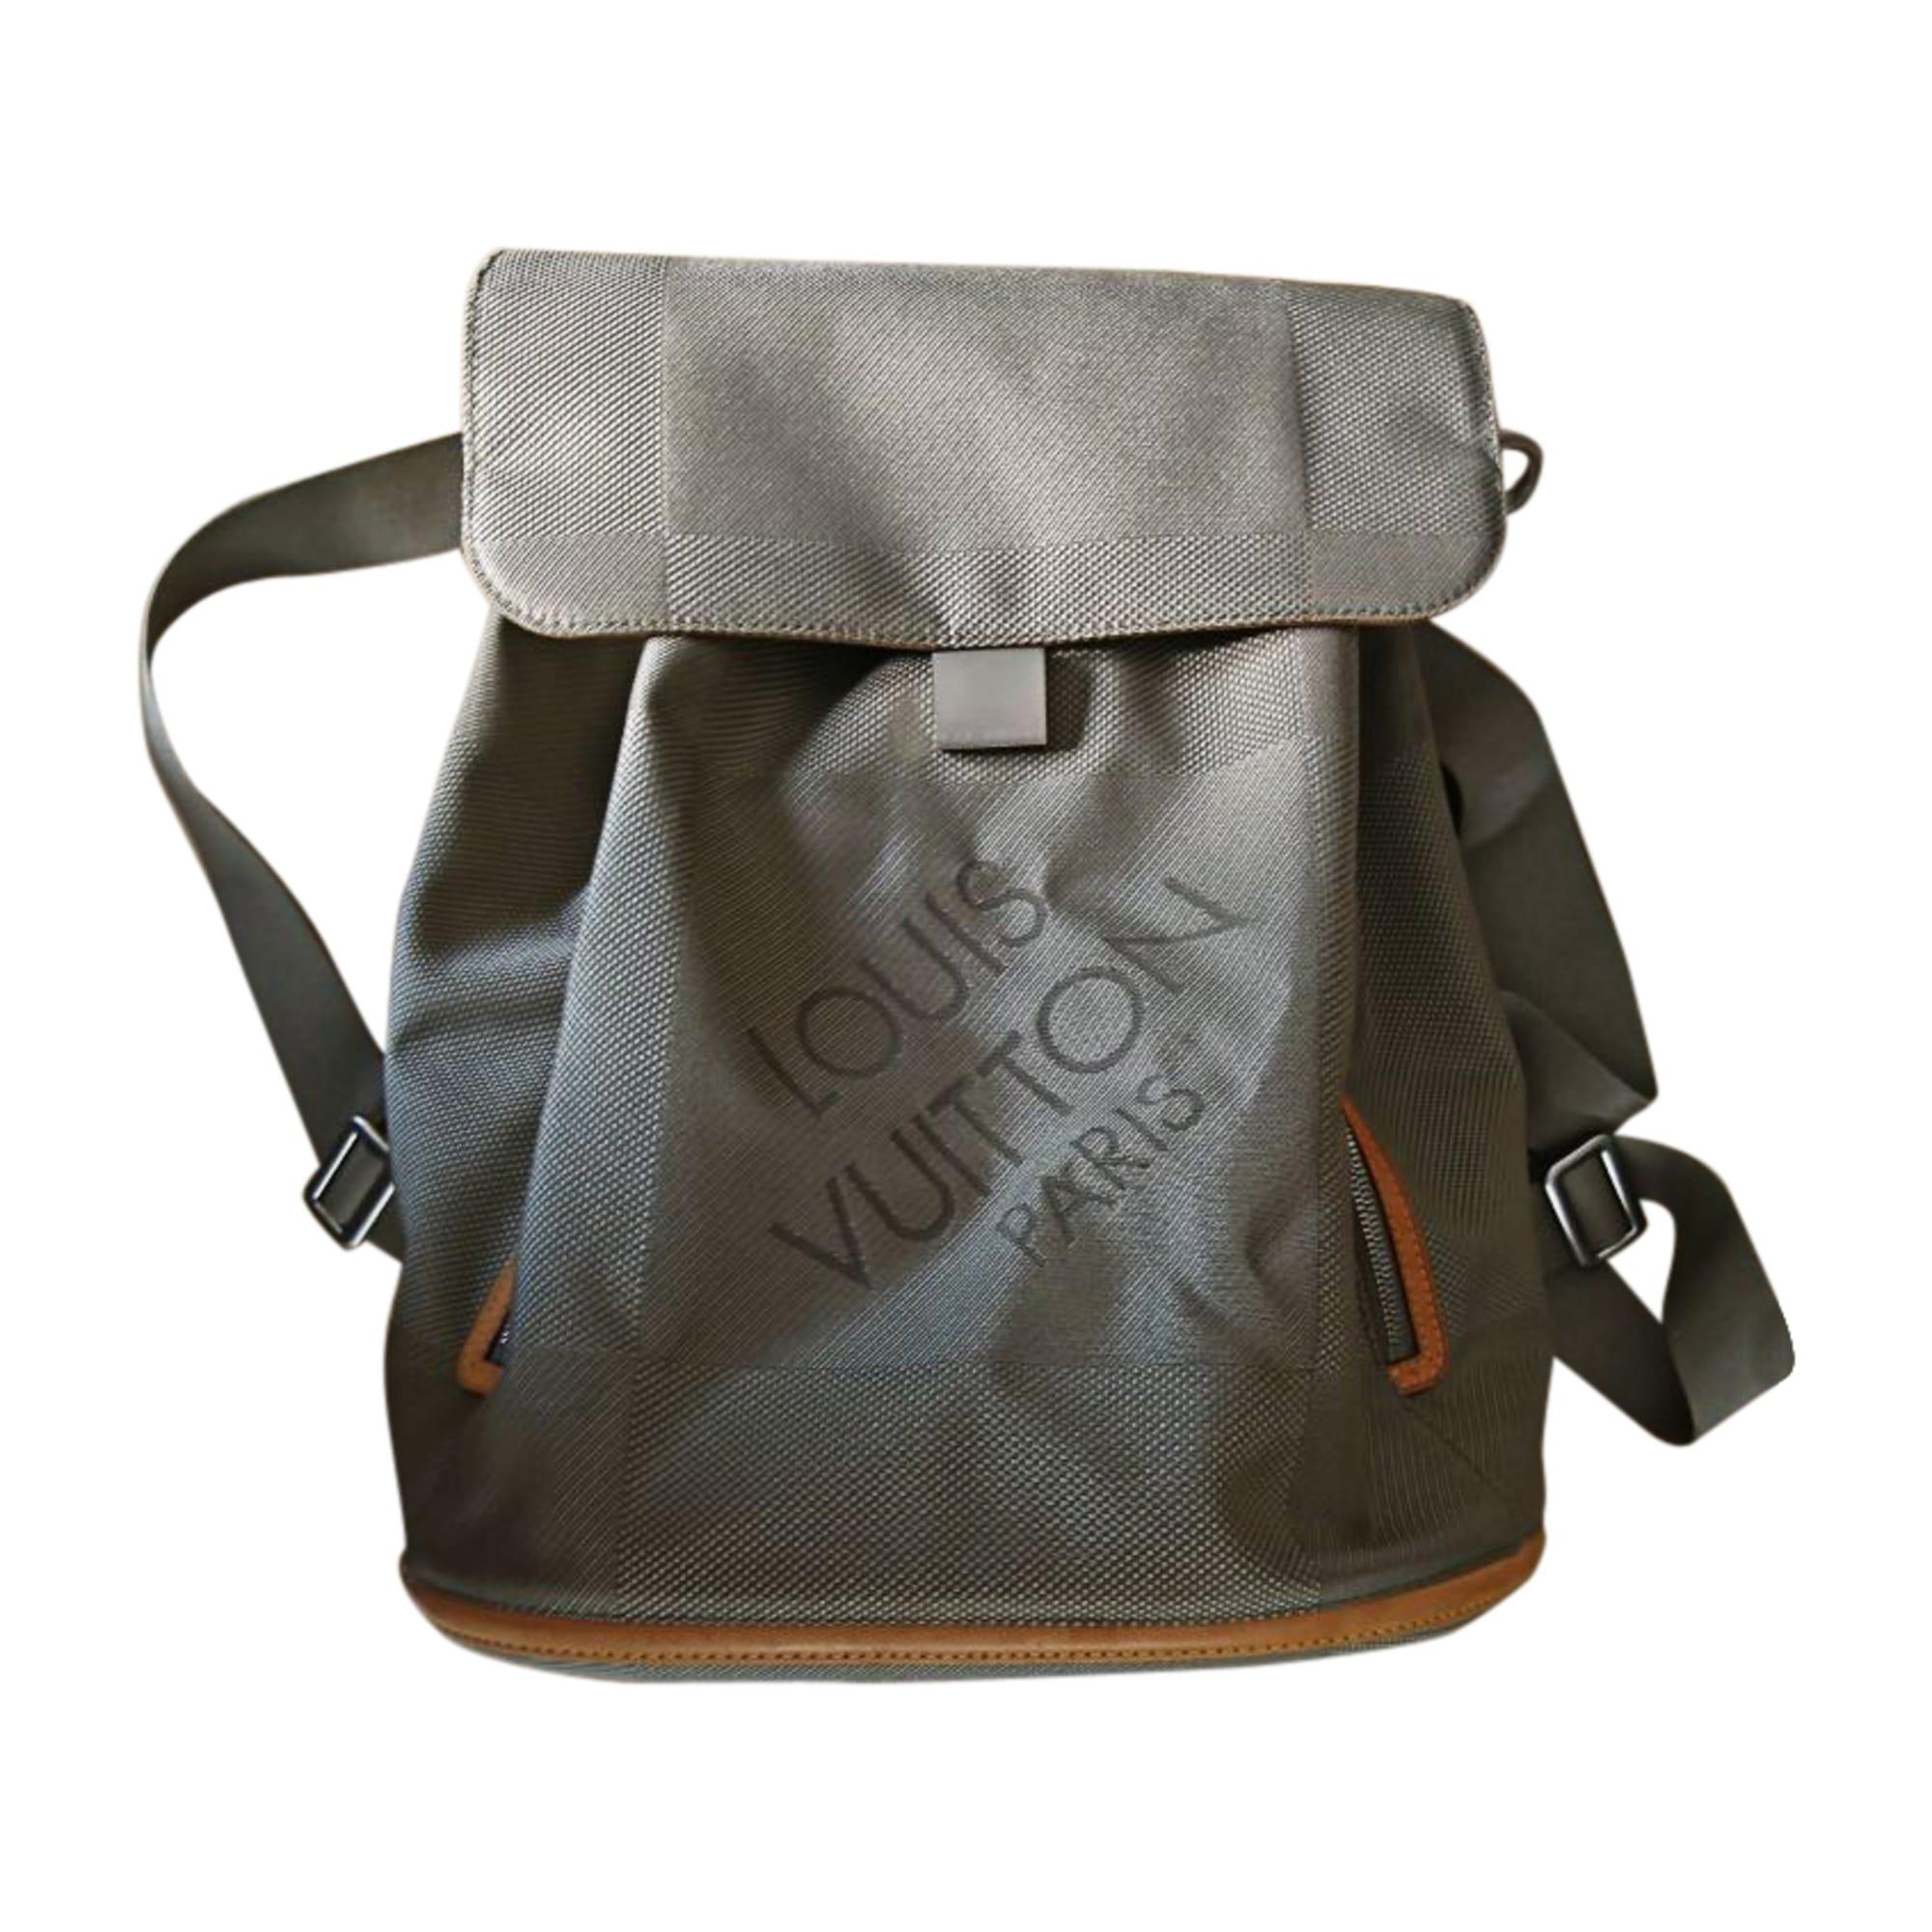 3dded165299 Rucksack LOUIS VUITTON grau vendu par Mino26 - 7810655